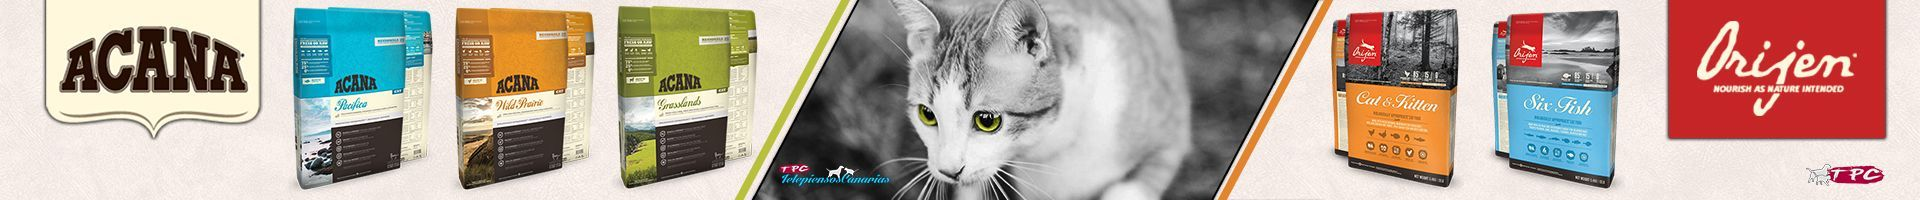 Orijen Acana pienso gatos TelepiensosCanarias 4 5 2018 221216